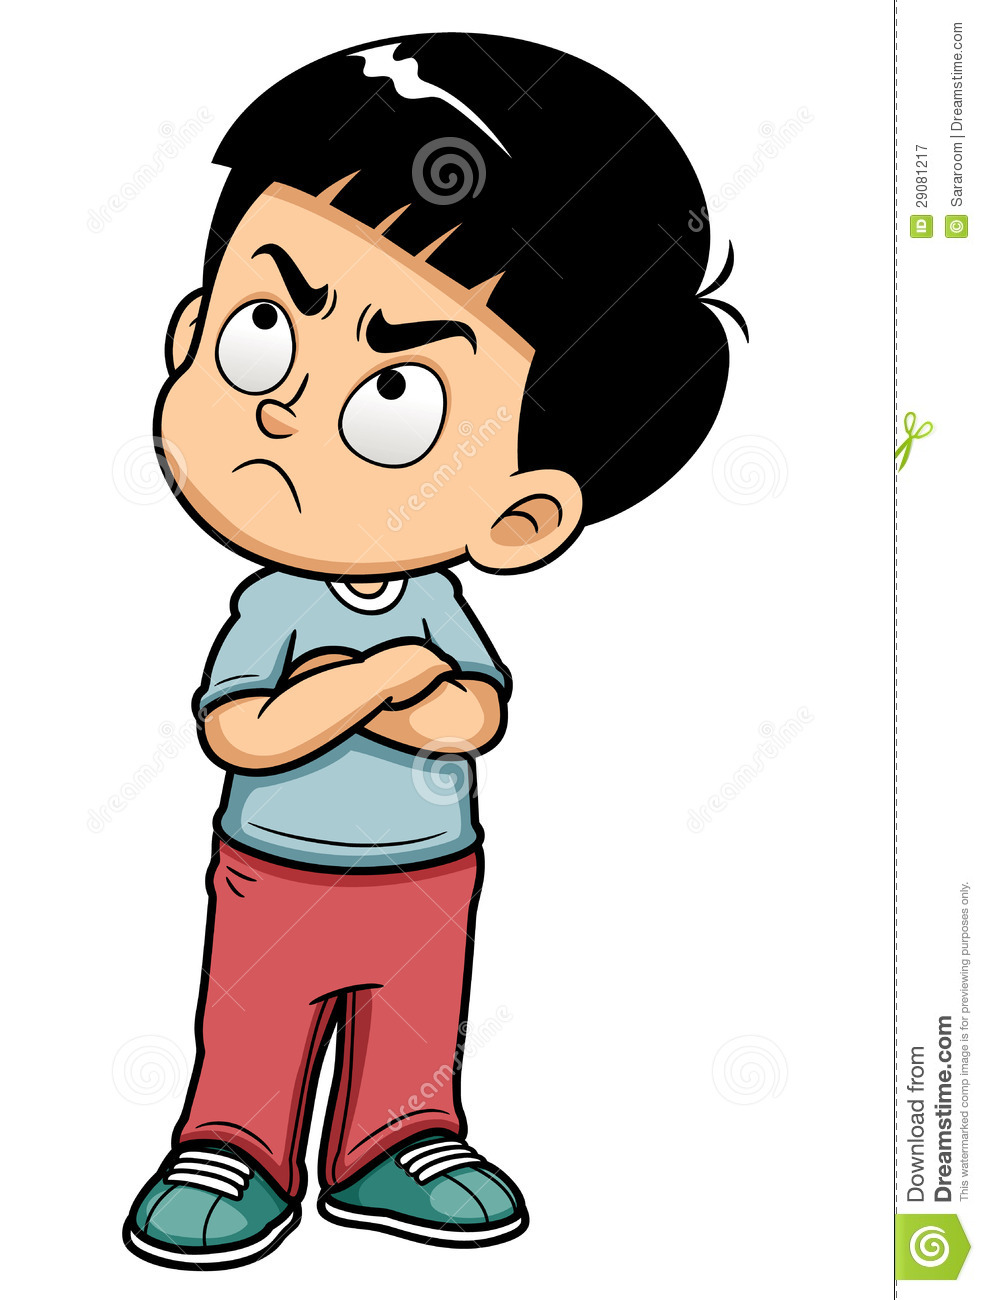 Clip Art Angry Clip Art angry boy clipart kid sad panda free images